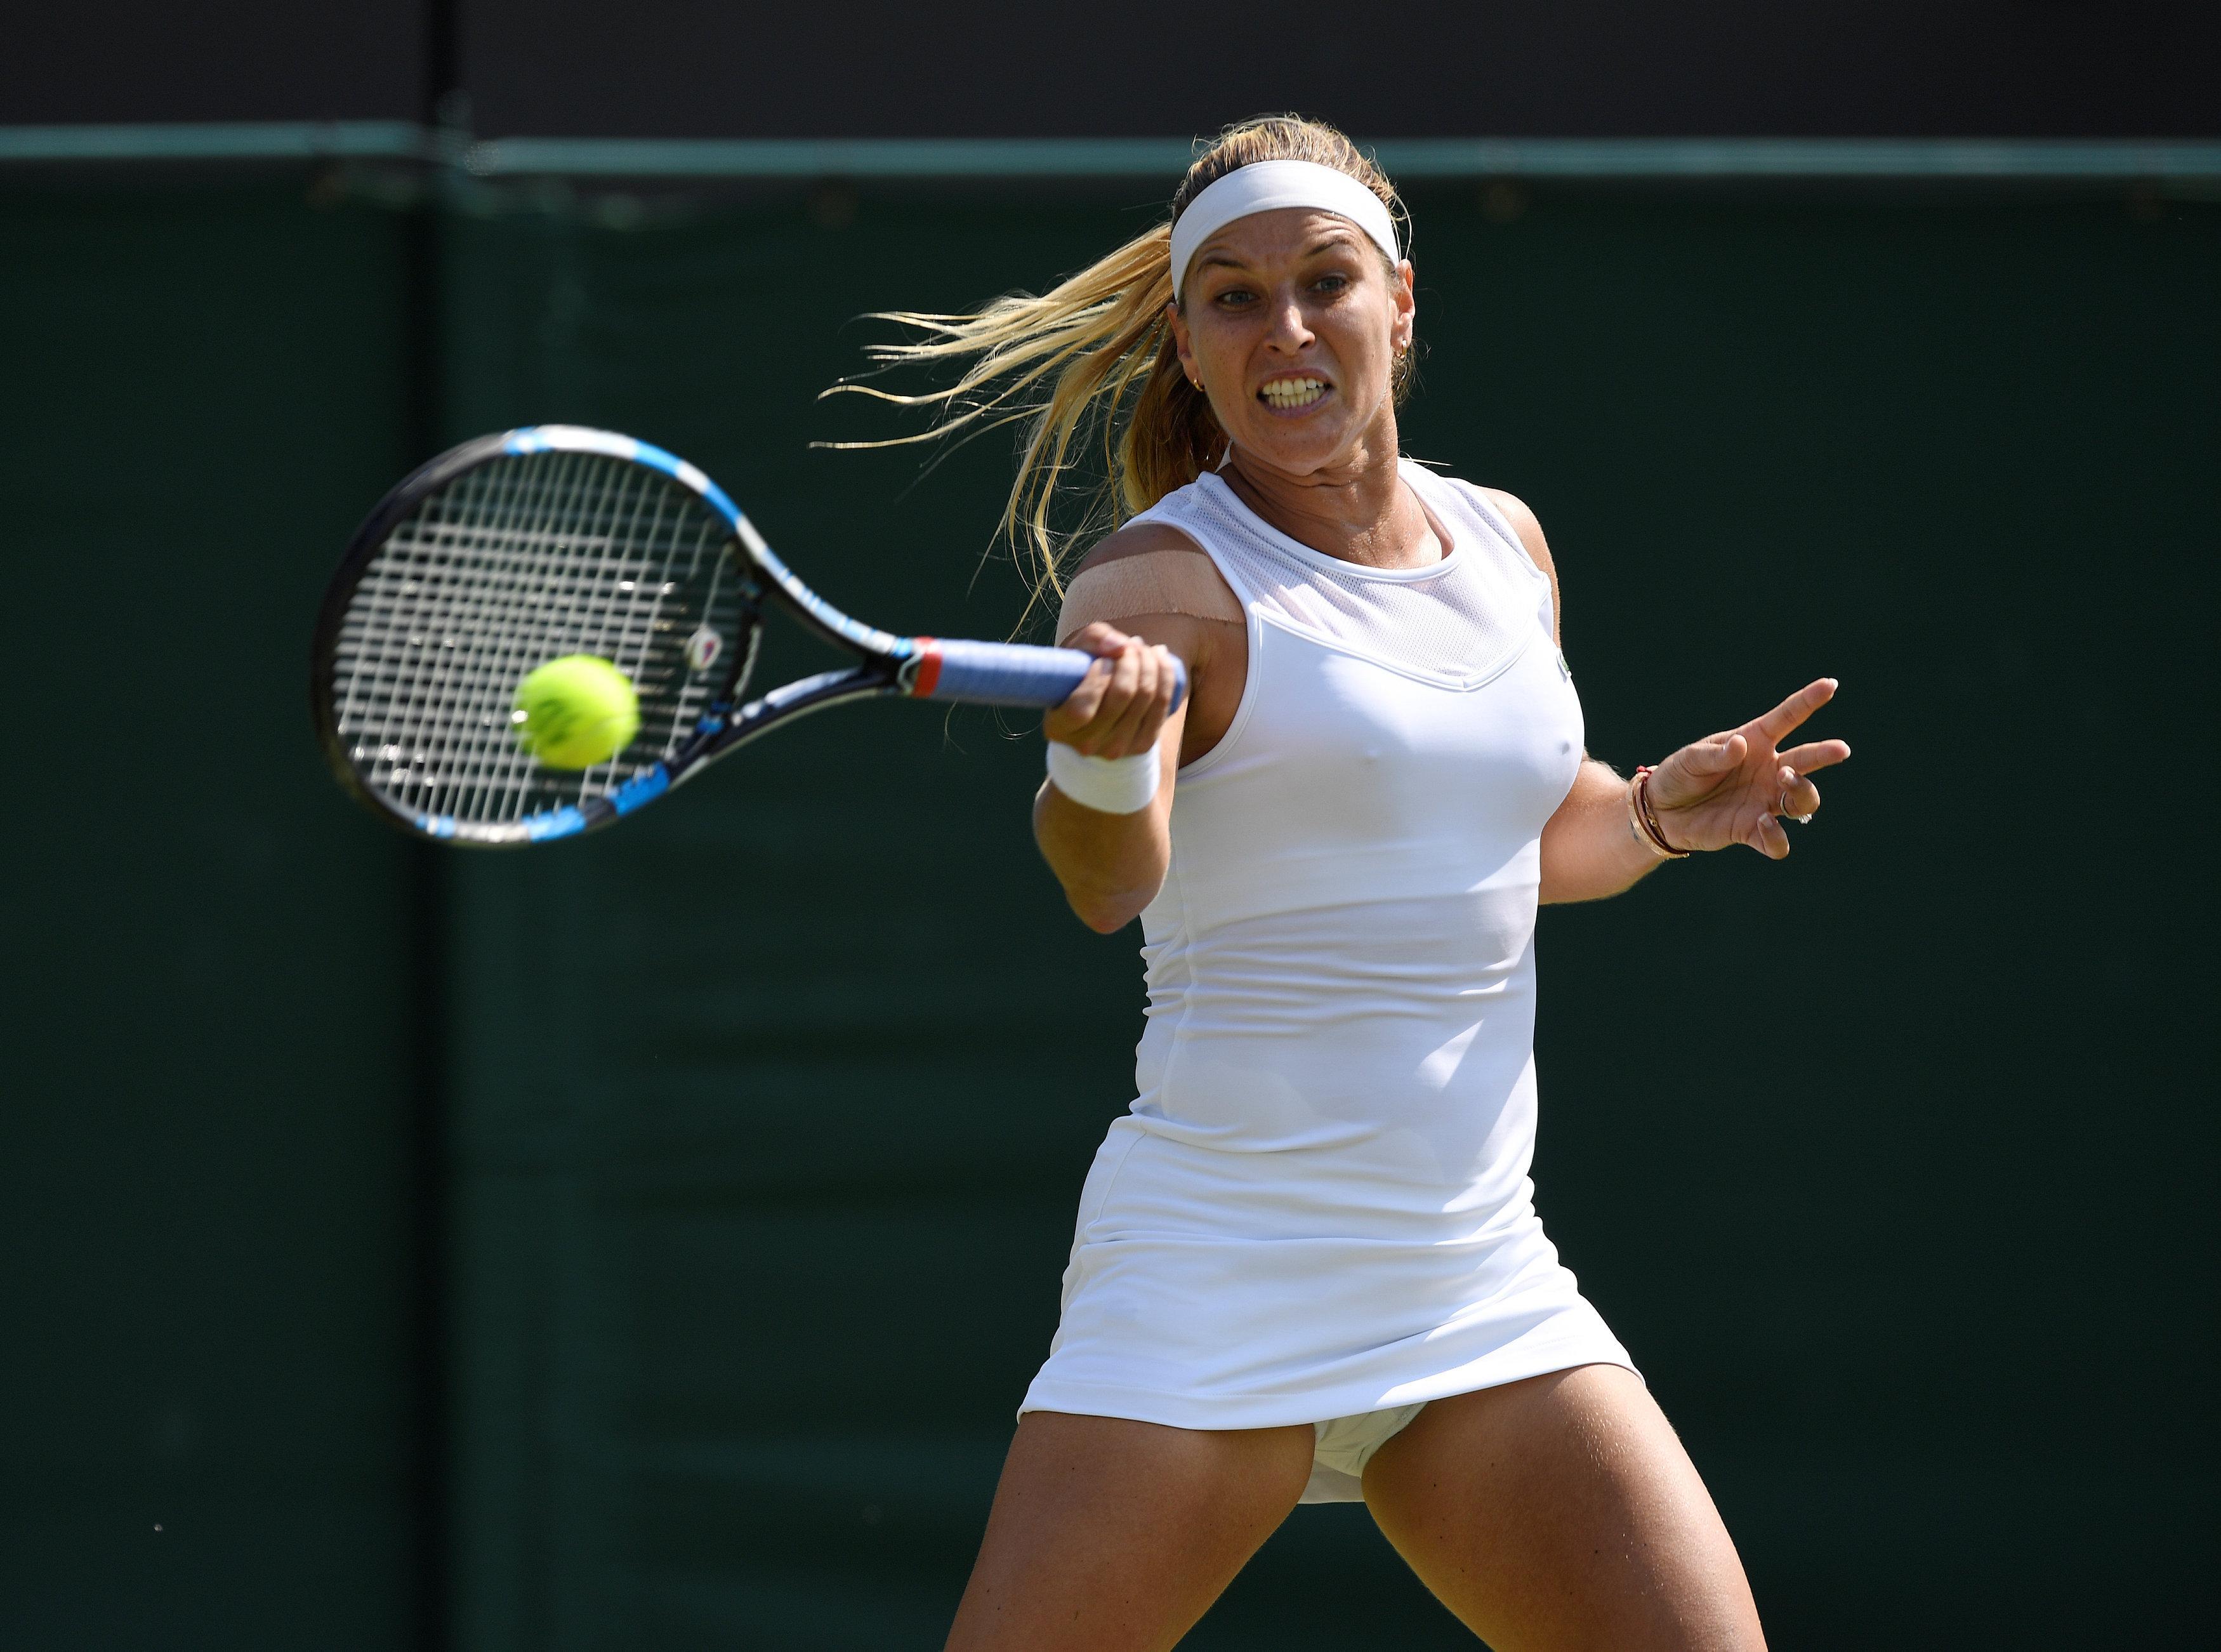 The ladies' singles last-16 kicks-off on day one of week two